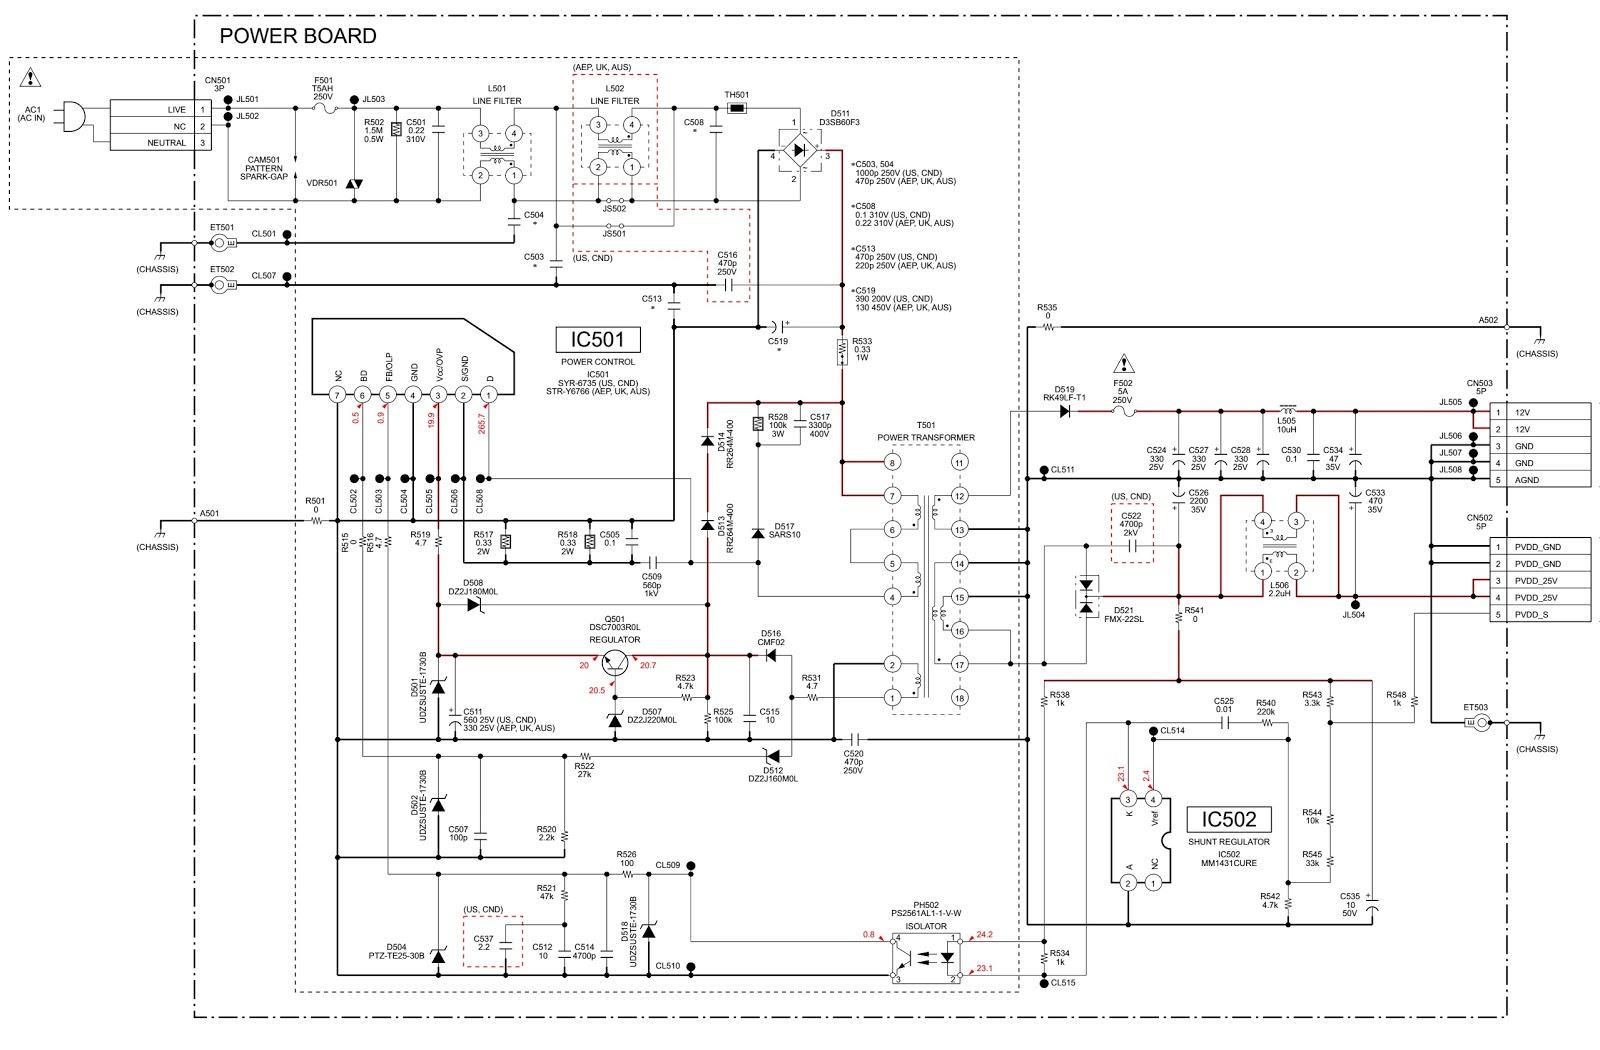 Sony Ht St7 Sound Wiring Diagram Complete Diagrams Xplod Harness Trusted U2022 Rh Soulmatestyle Co Car Radio